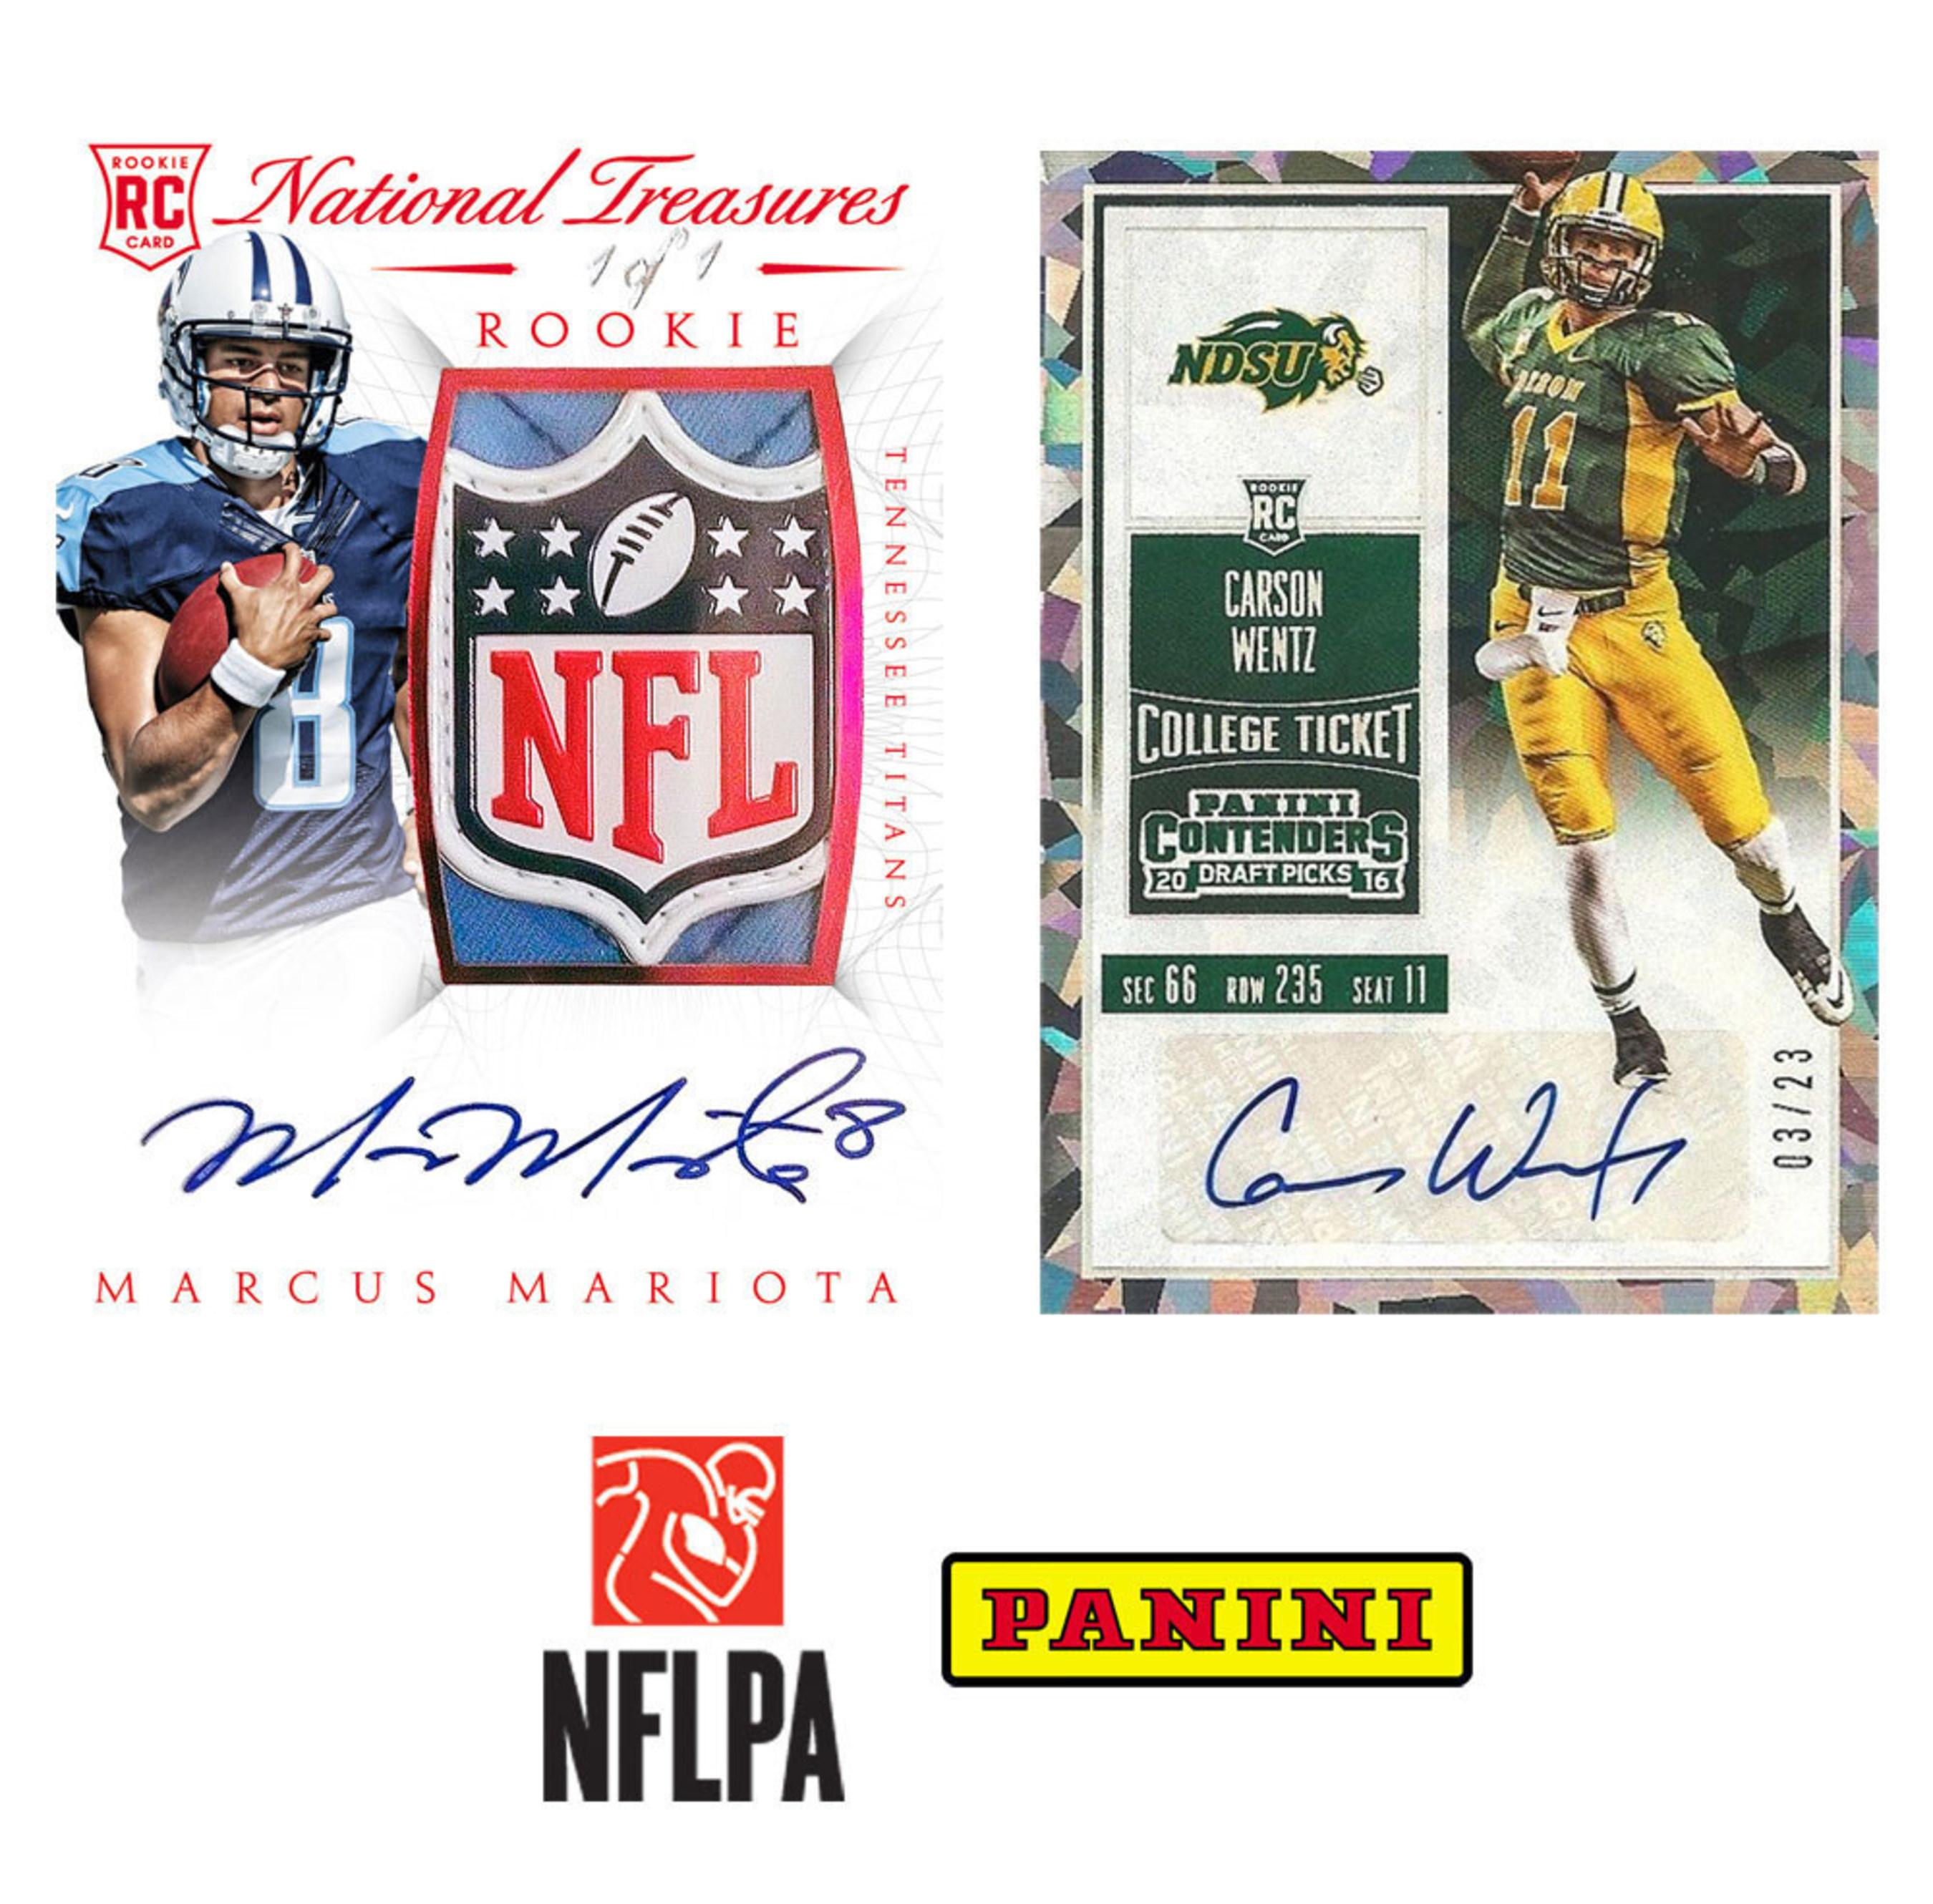 Panini America, NFL Players Inc., Unveil Inaugural Edition Of NFLPA Panini Trading Card Index